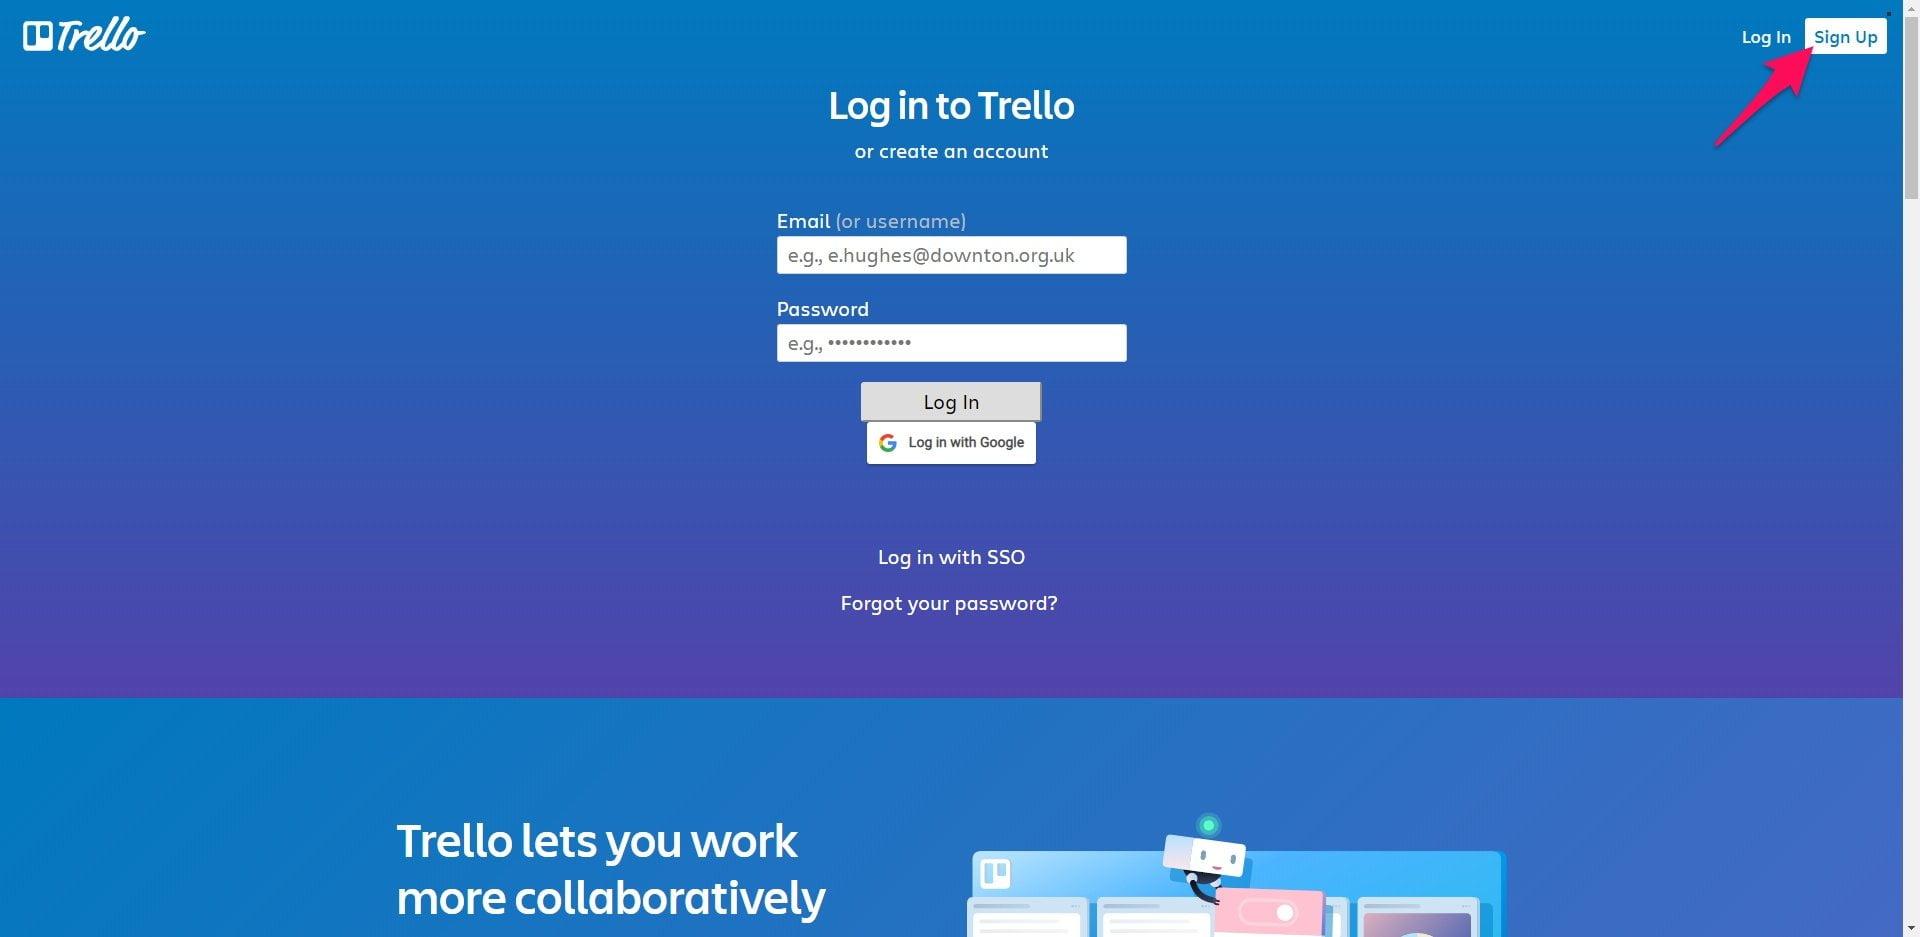 Trello sign up